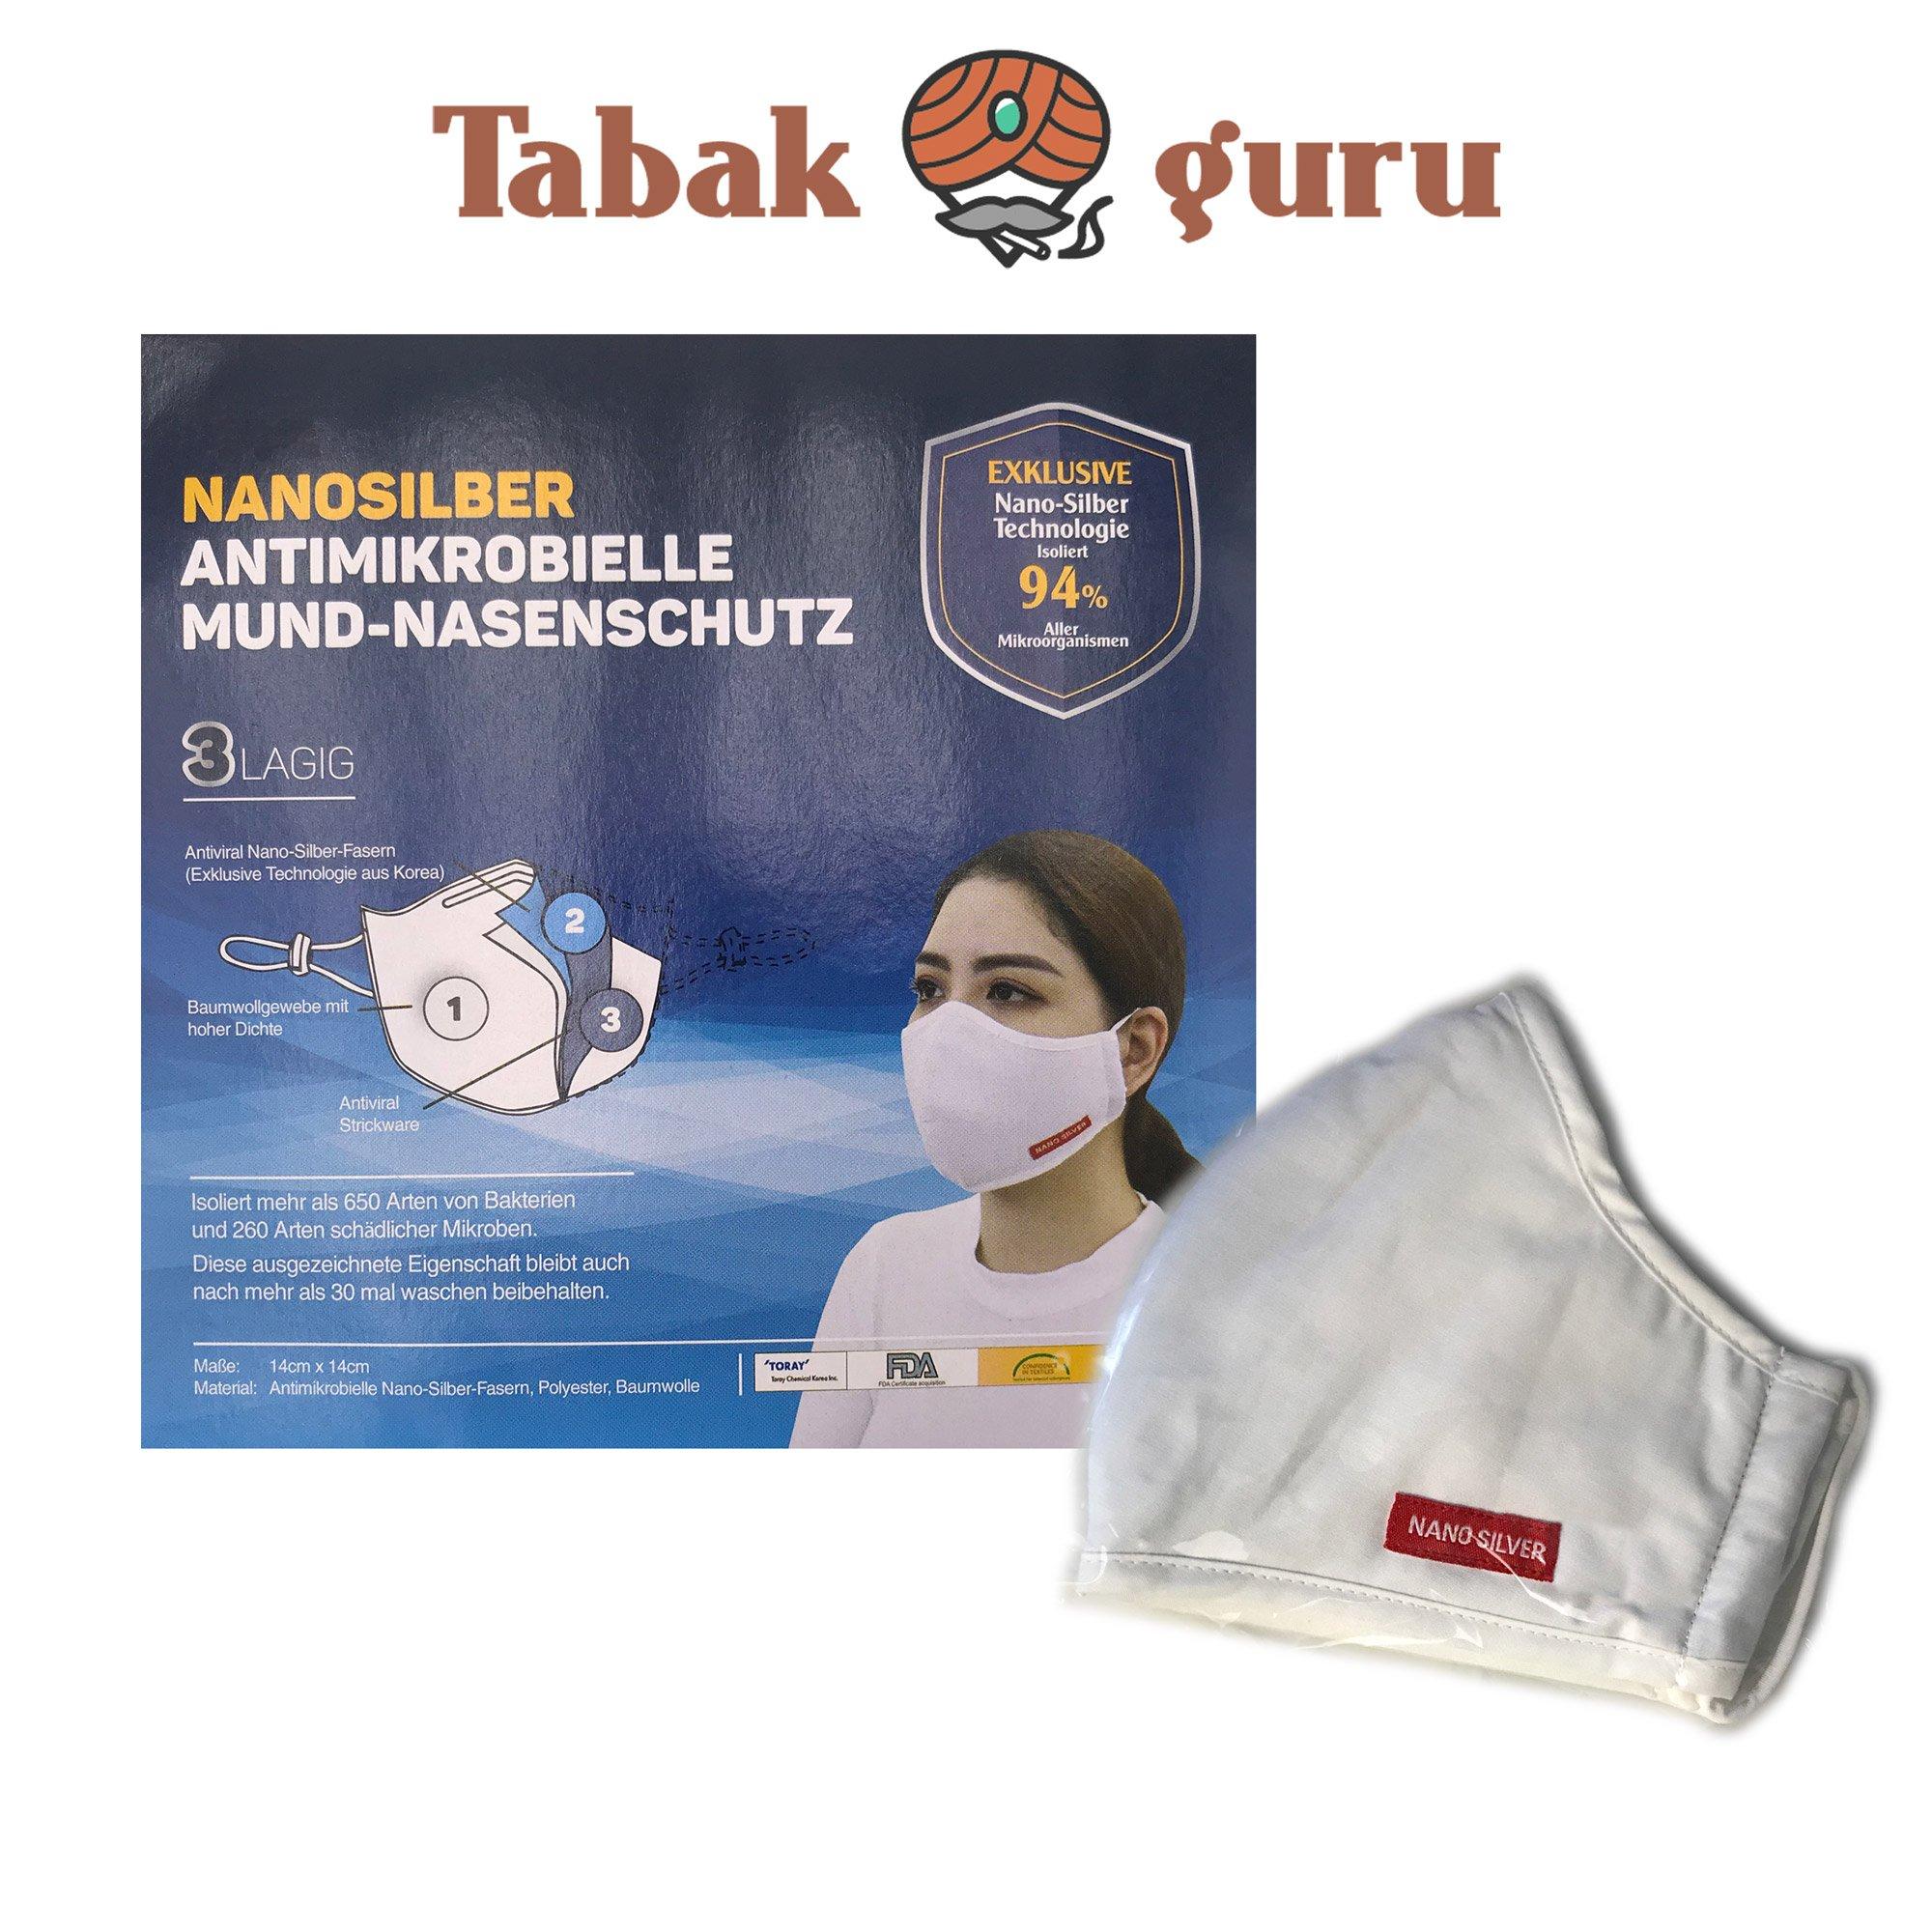 1x waschbare  Mundschutz Nasenschutz  Nanosilber 3 LAGIG Neu